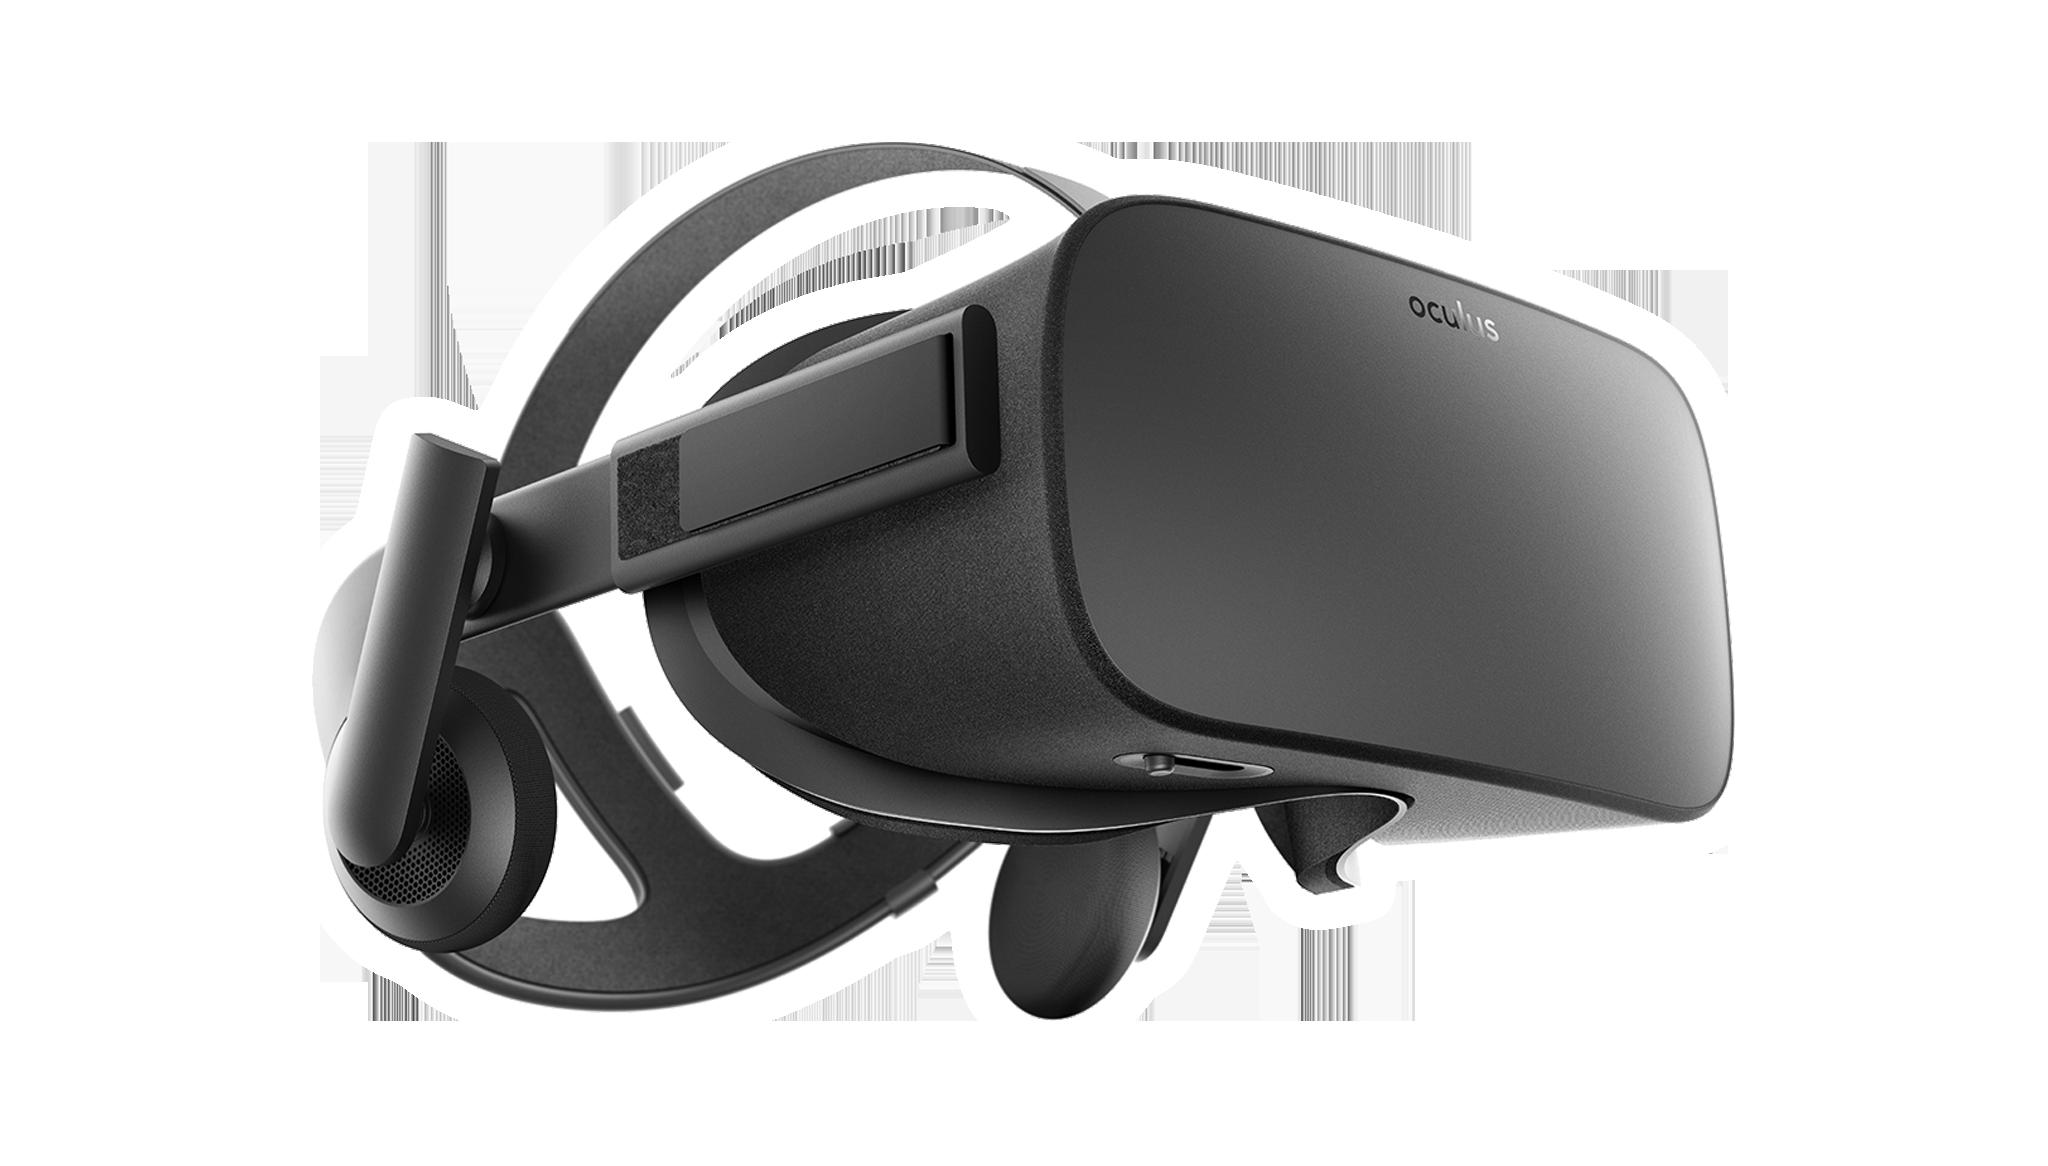 Oculus rift vr clipart banner library library Oculus Rift Virtual reality headset Oculus VR HTC Vive - VR headset ... banner library library